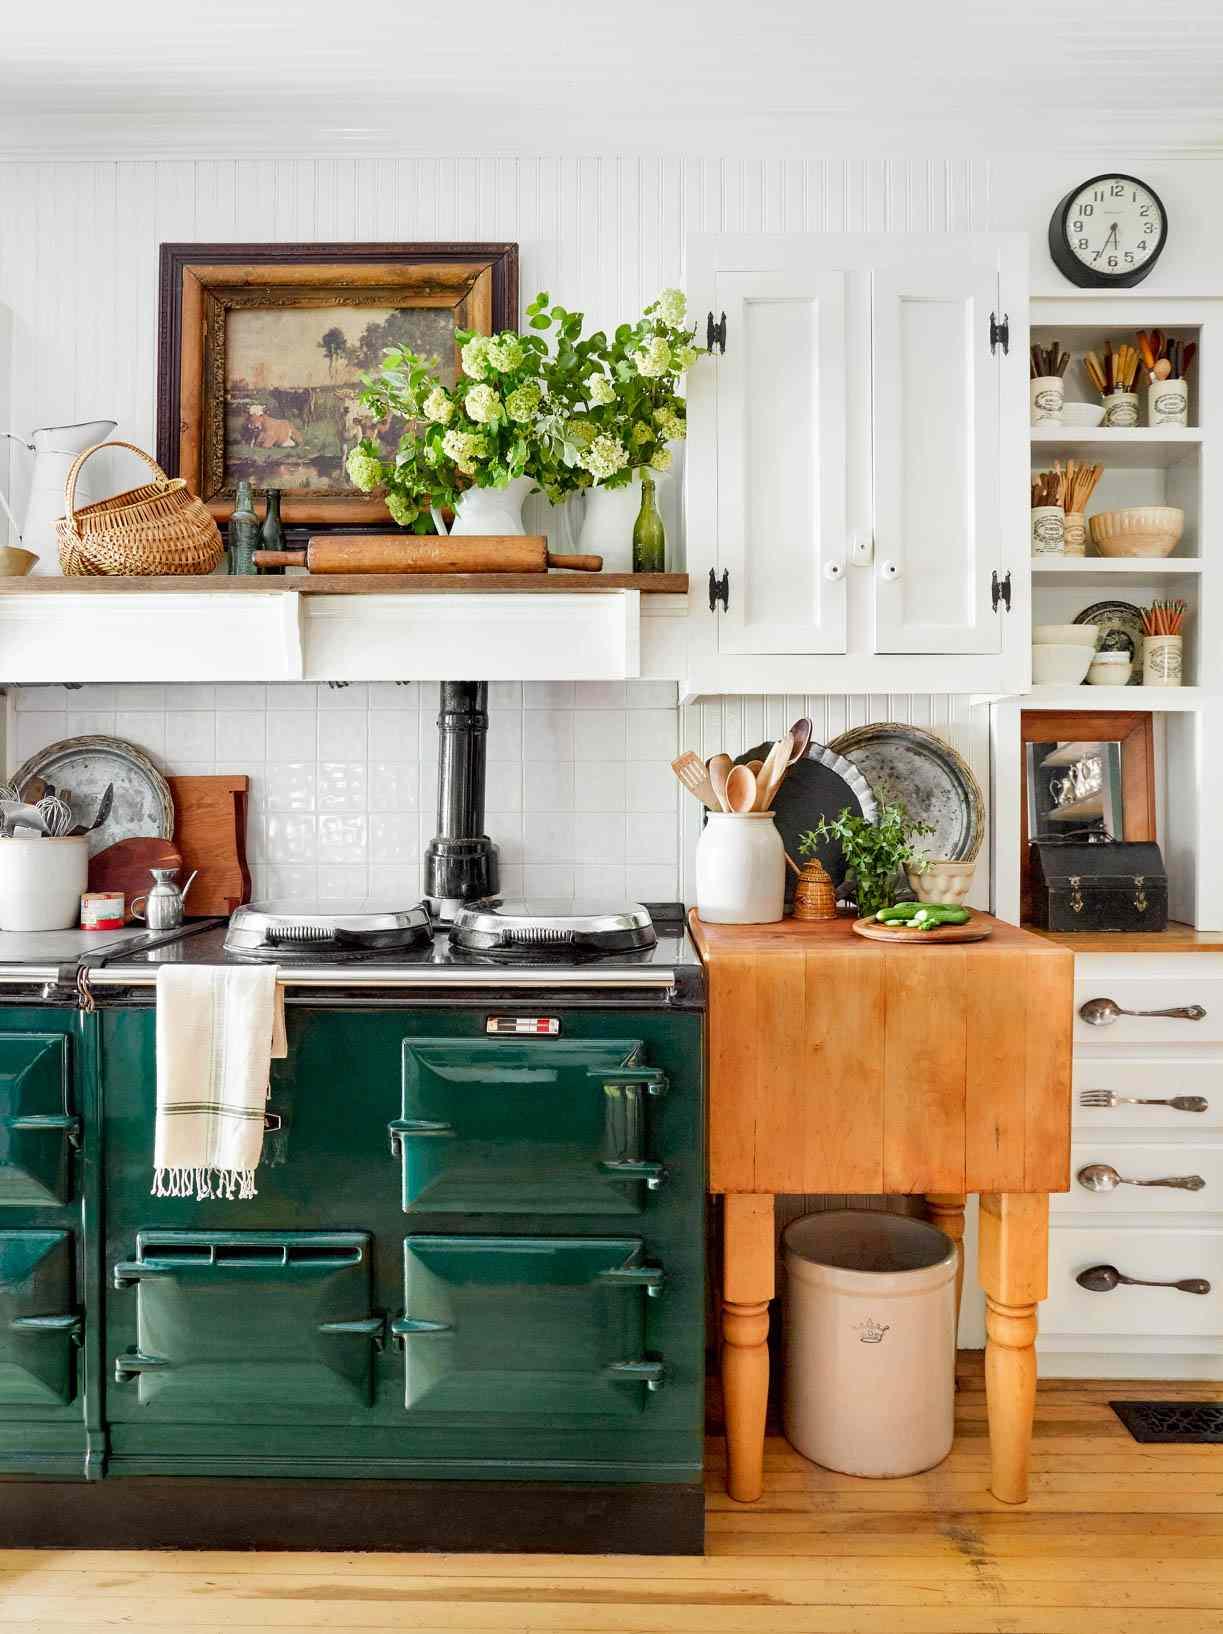 Rustic cottage kitchen